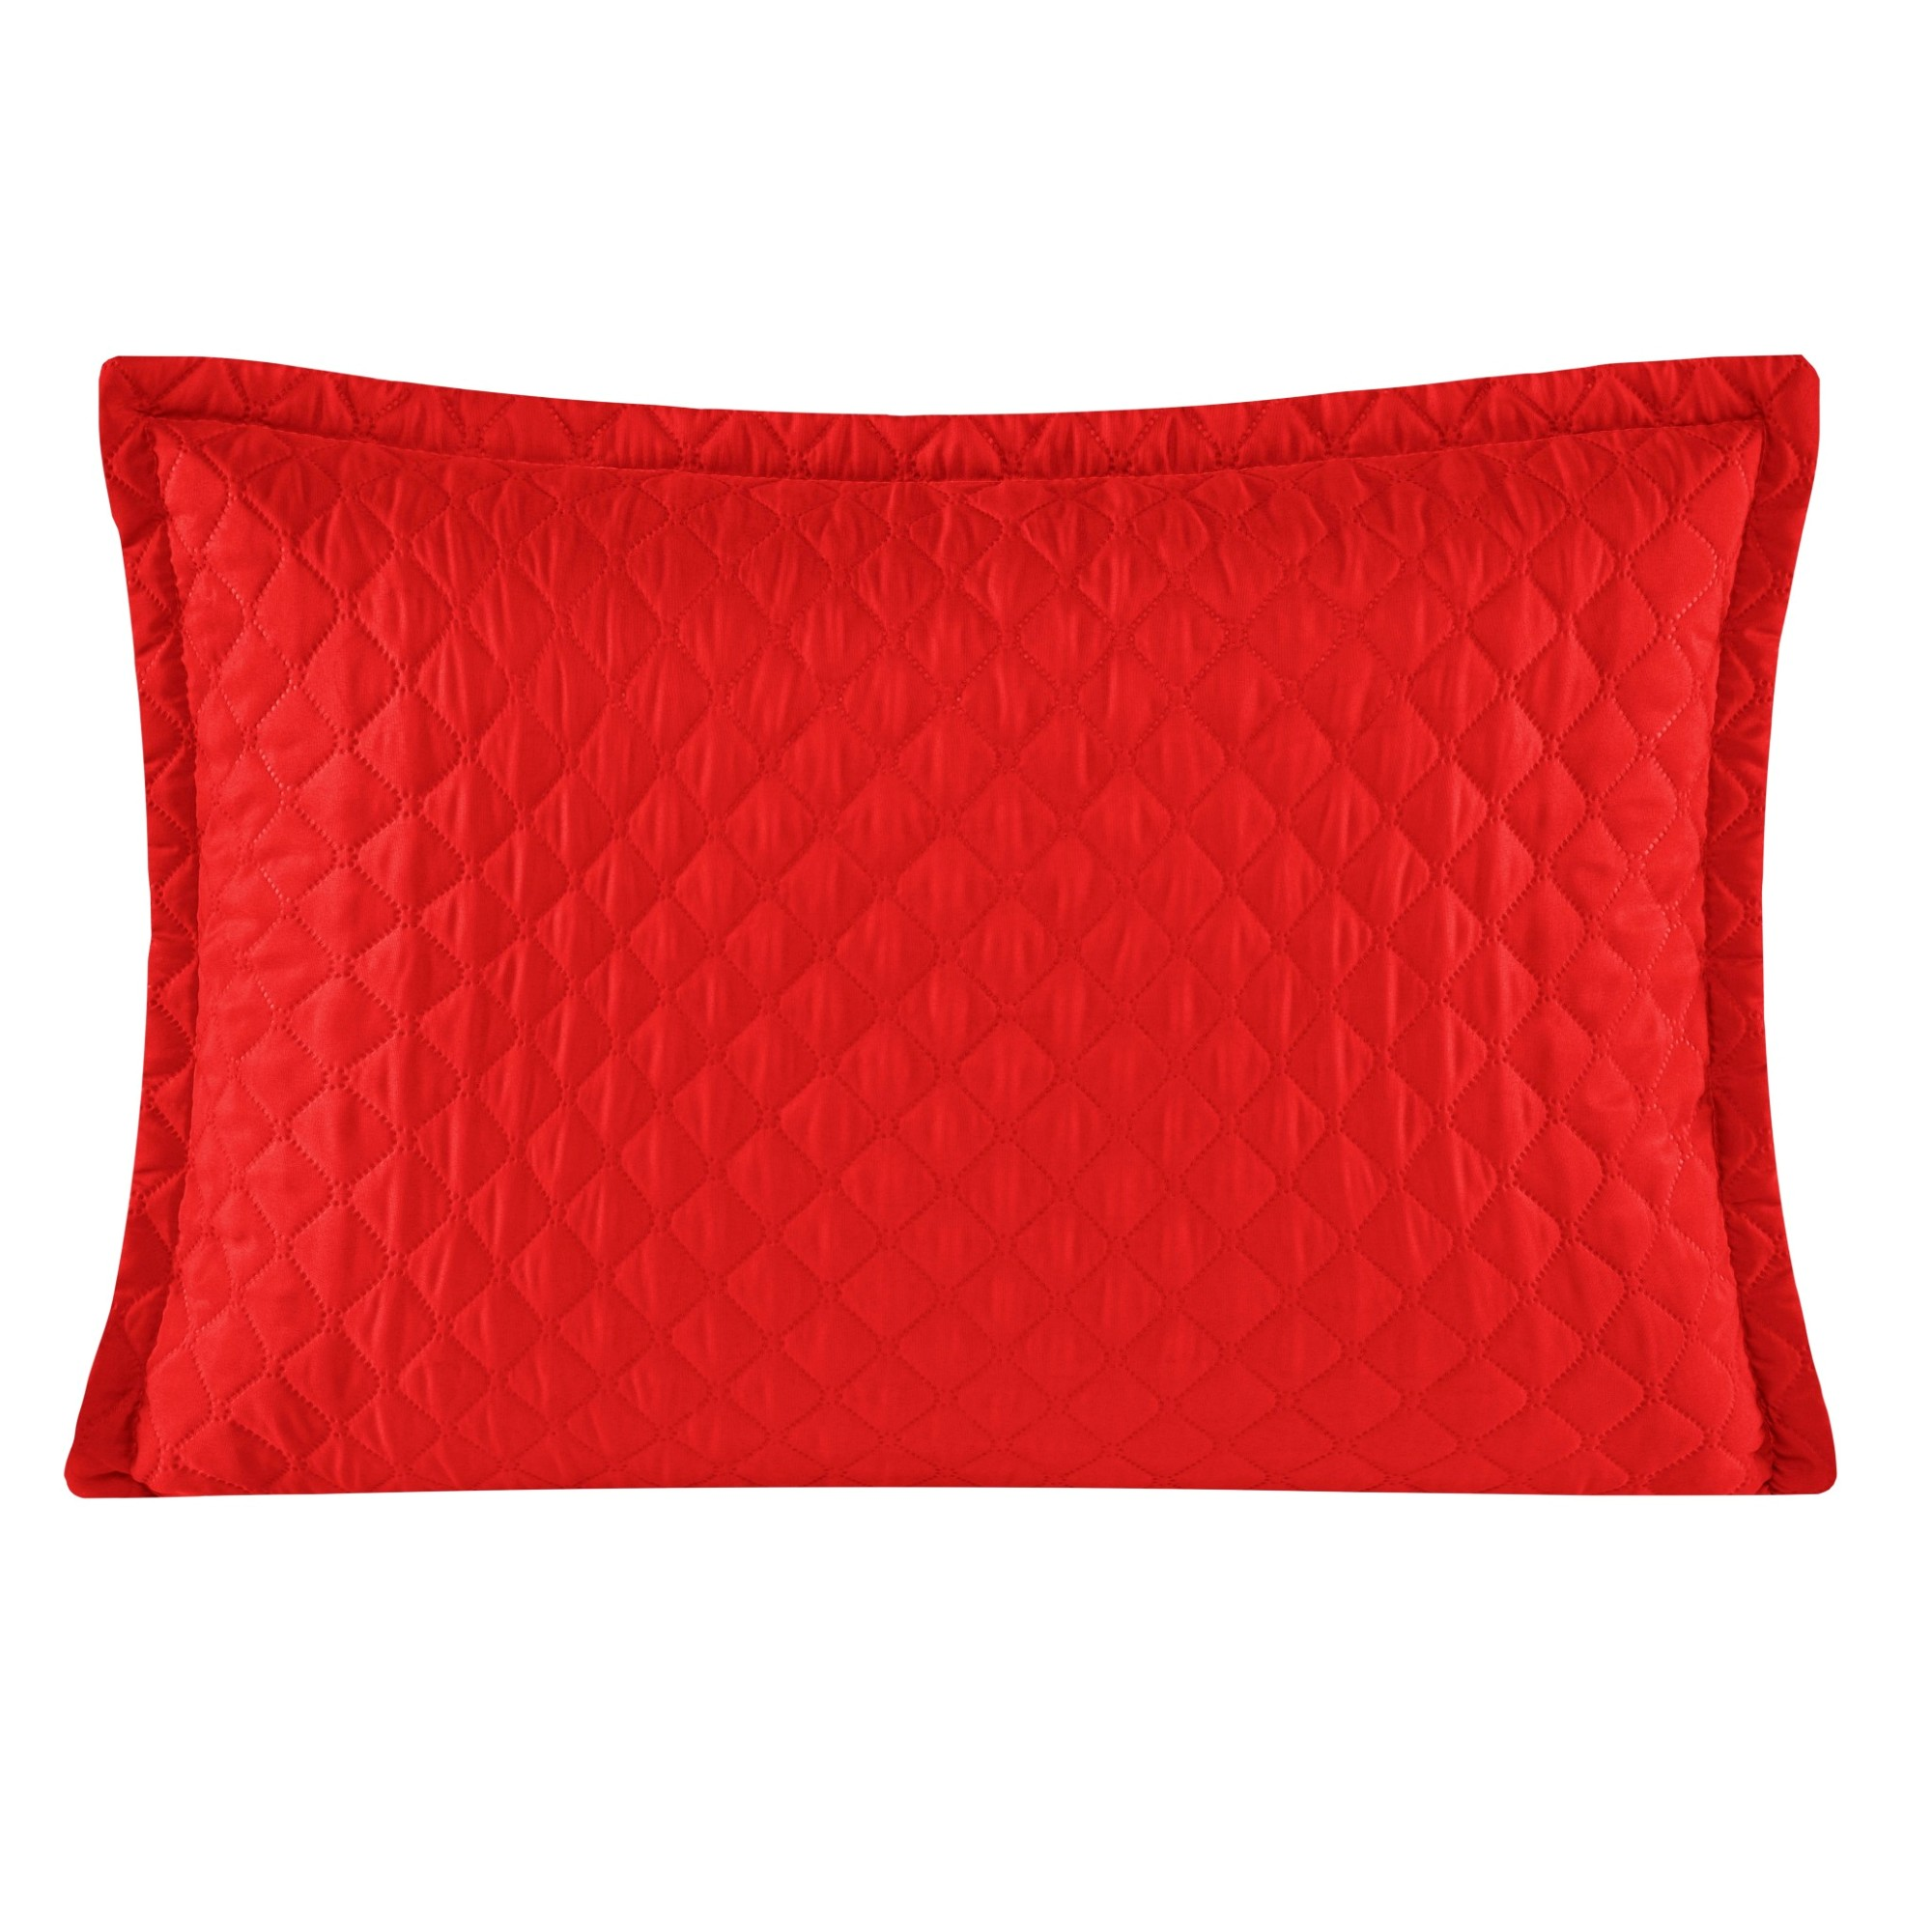 Porta Travesseiro 50x70 cm Delicata Vemelho - Yohana